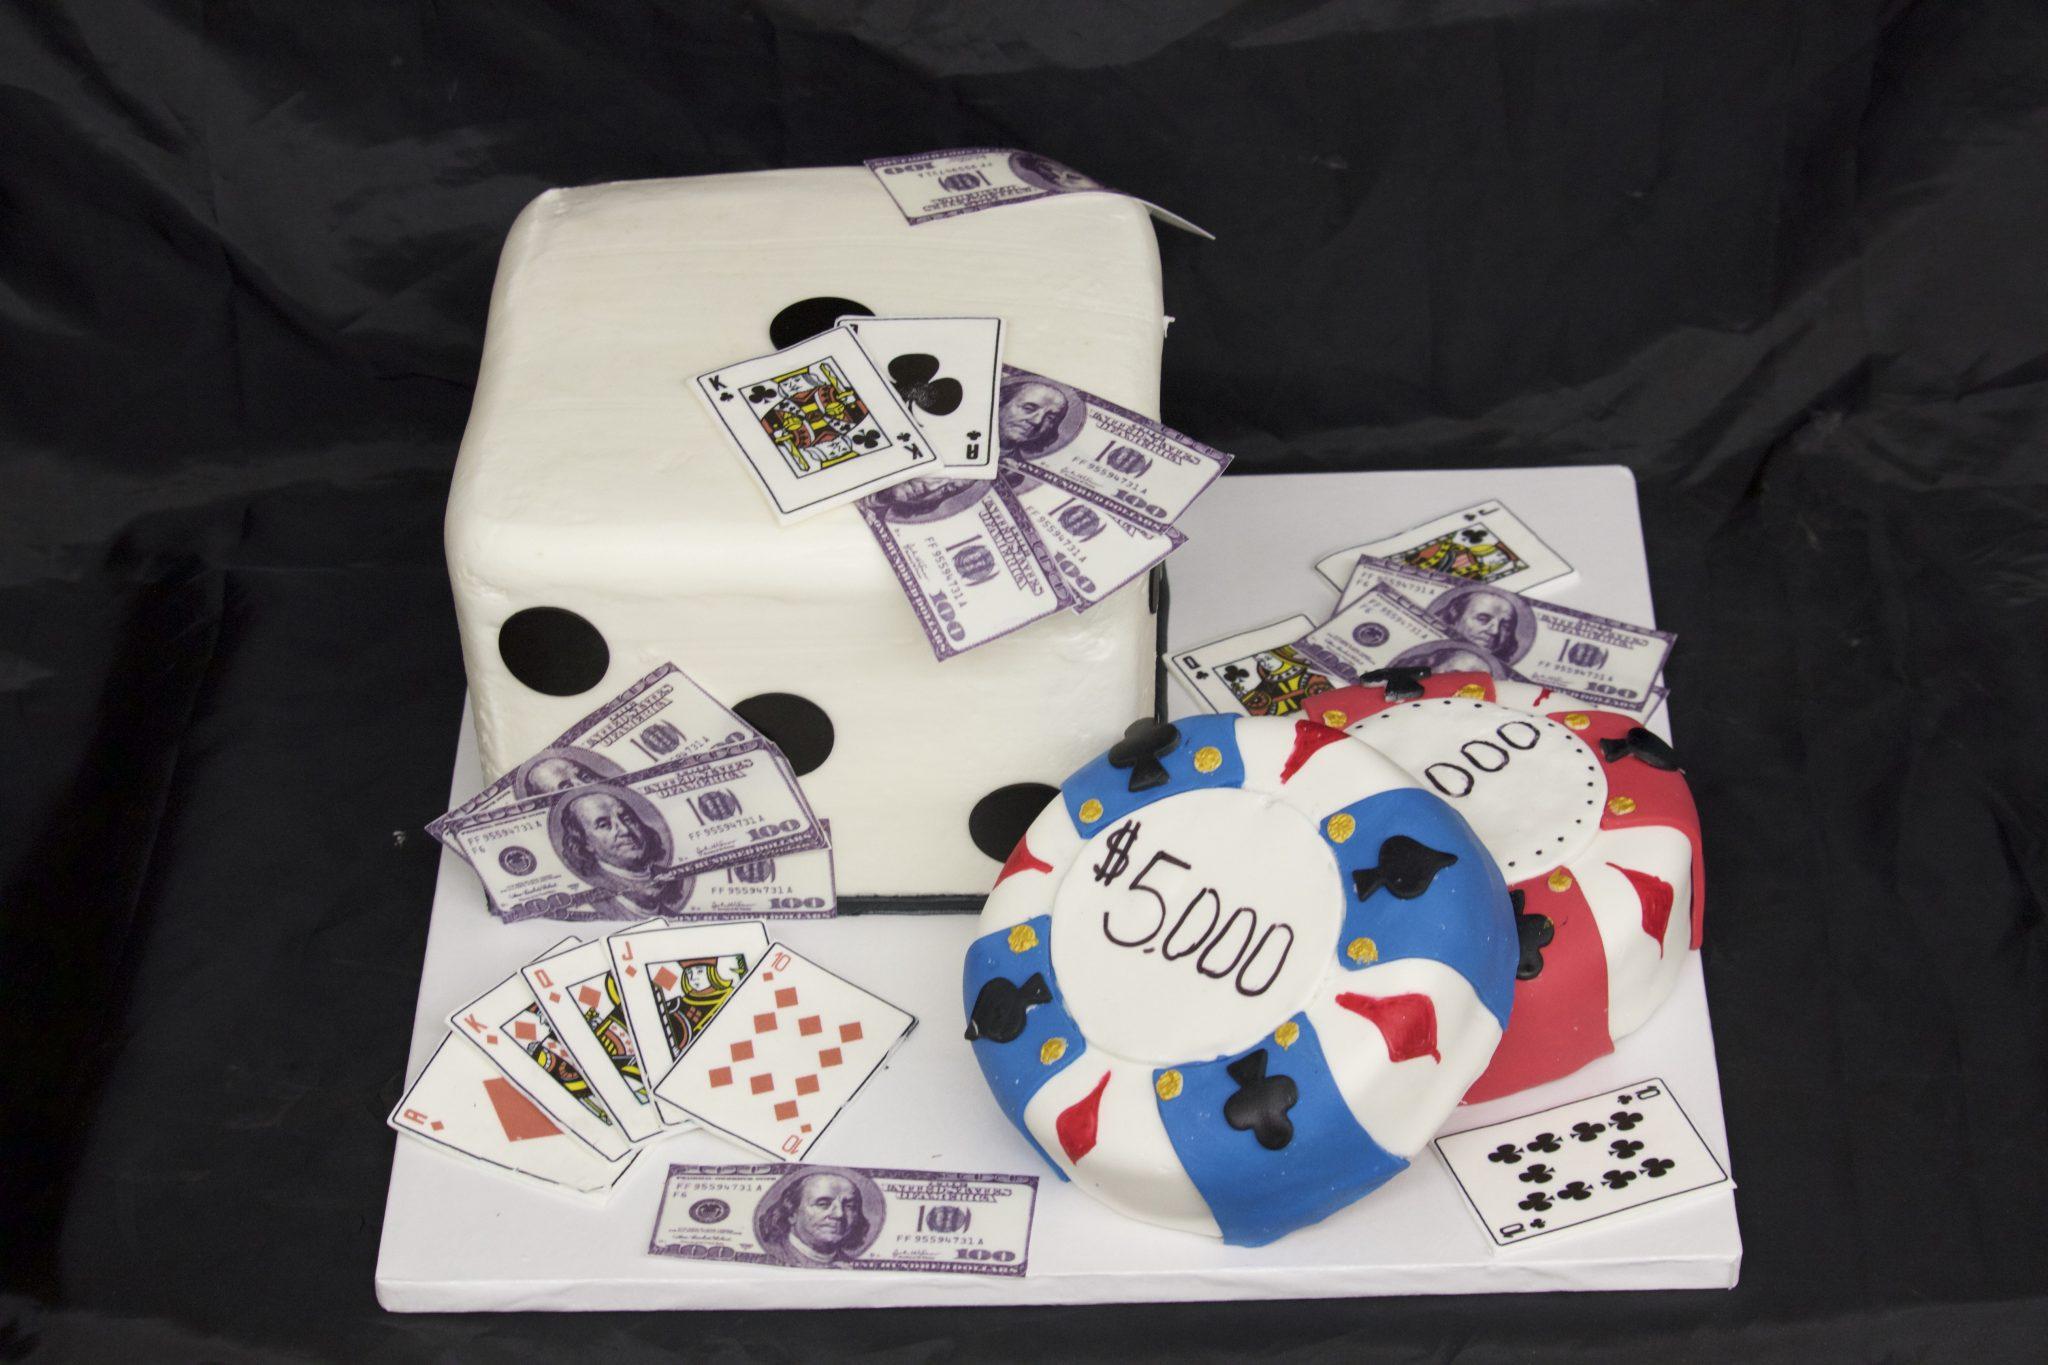 Vegas Game Night, cake, adults, dice, cards, poker, money, birthday, jacksonville, beach, bakery